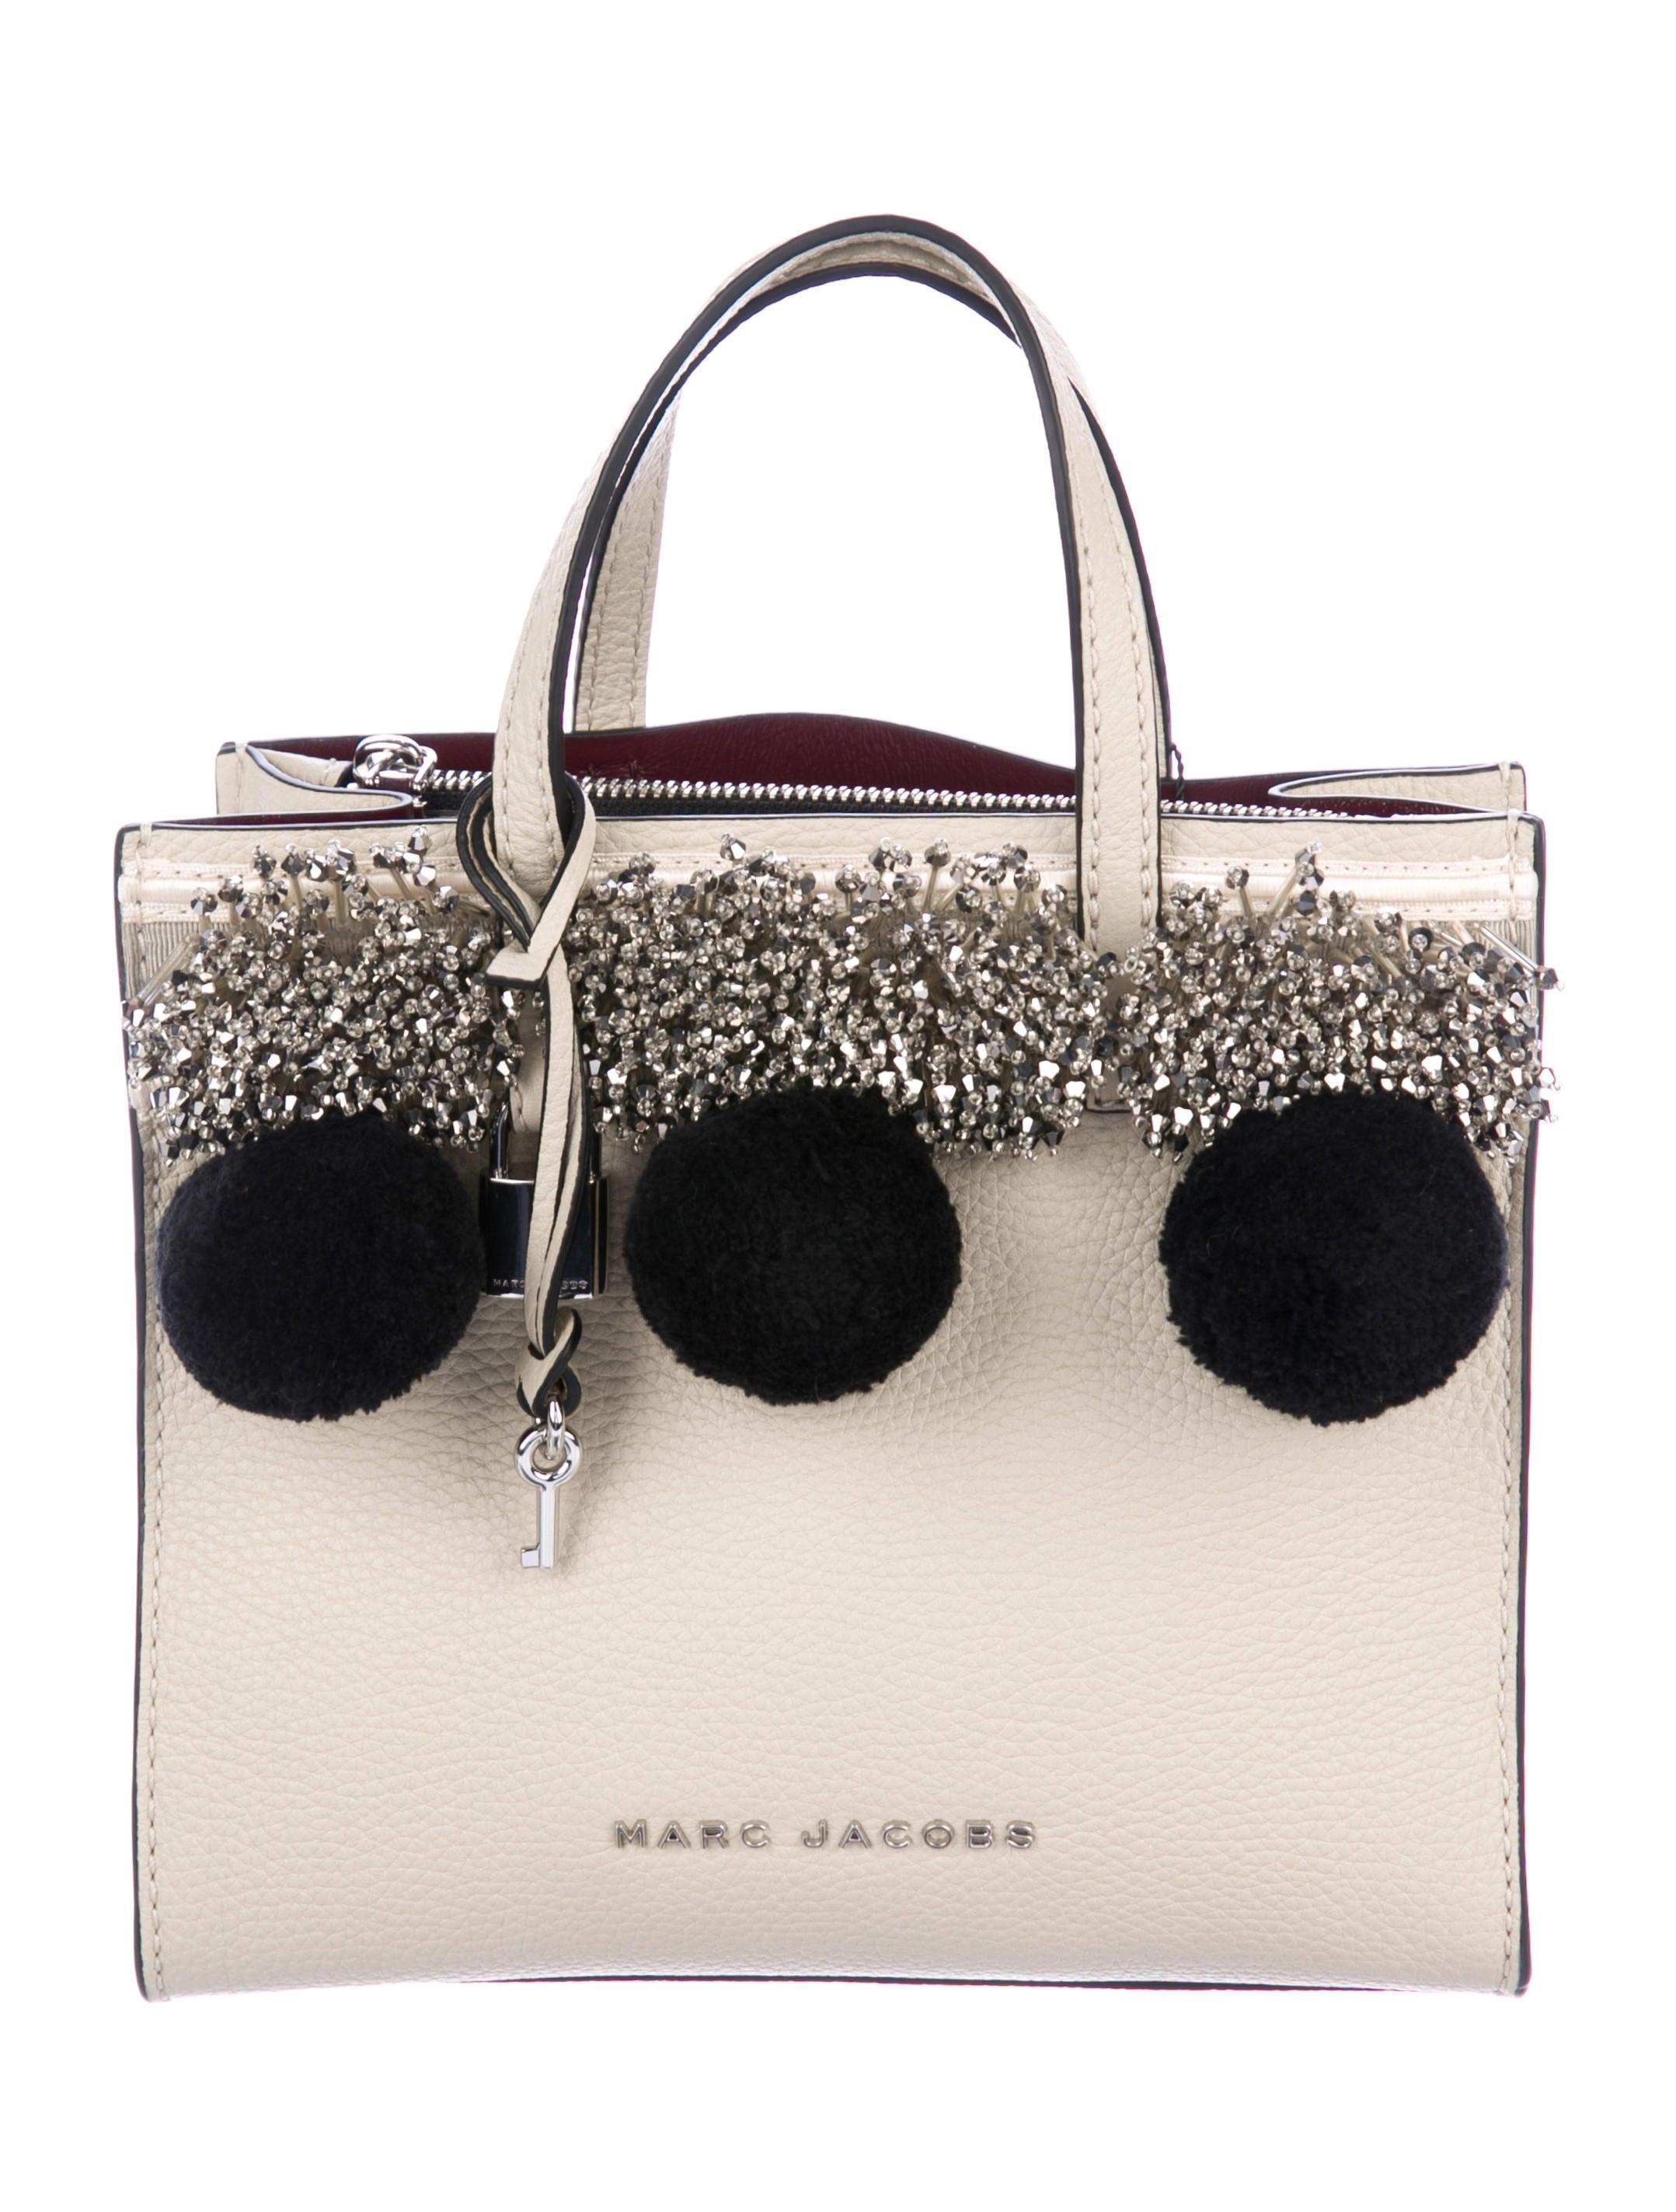 80e36fbd964a Marc Jacobs Mini Grind Pompom Satchel w  Tags - Handbags - MAR57760 ...